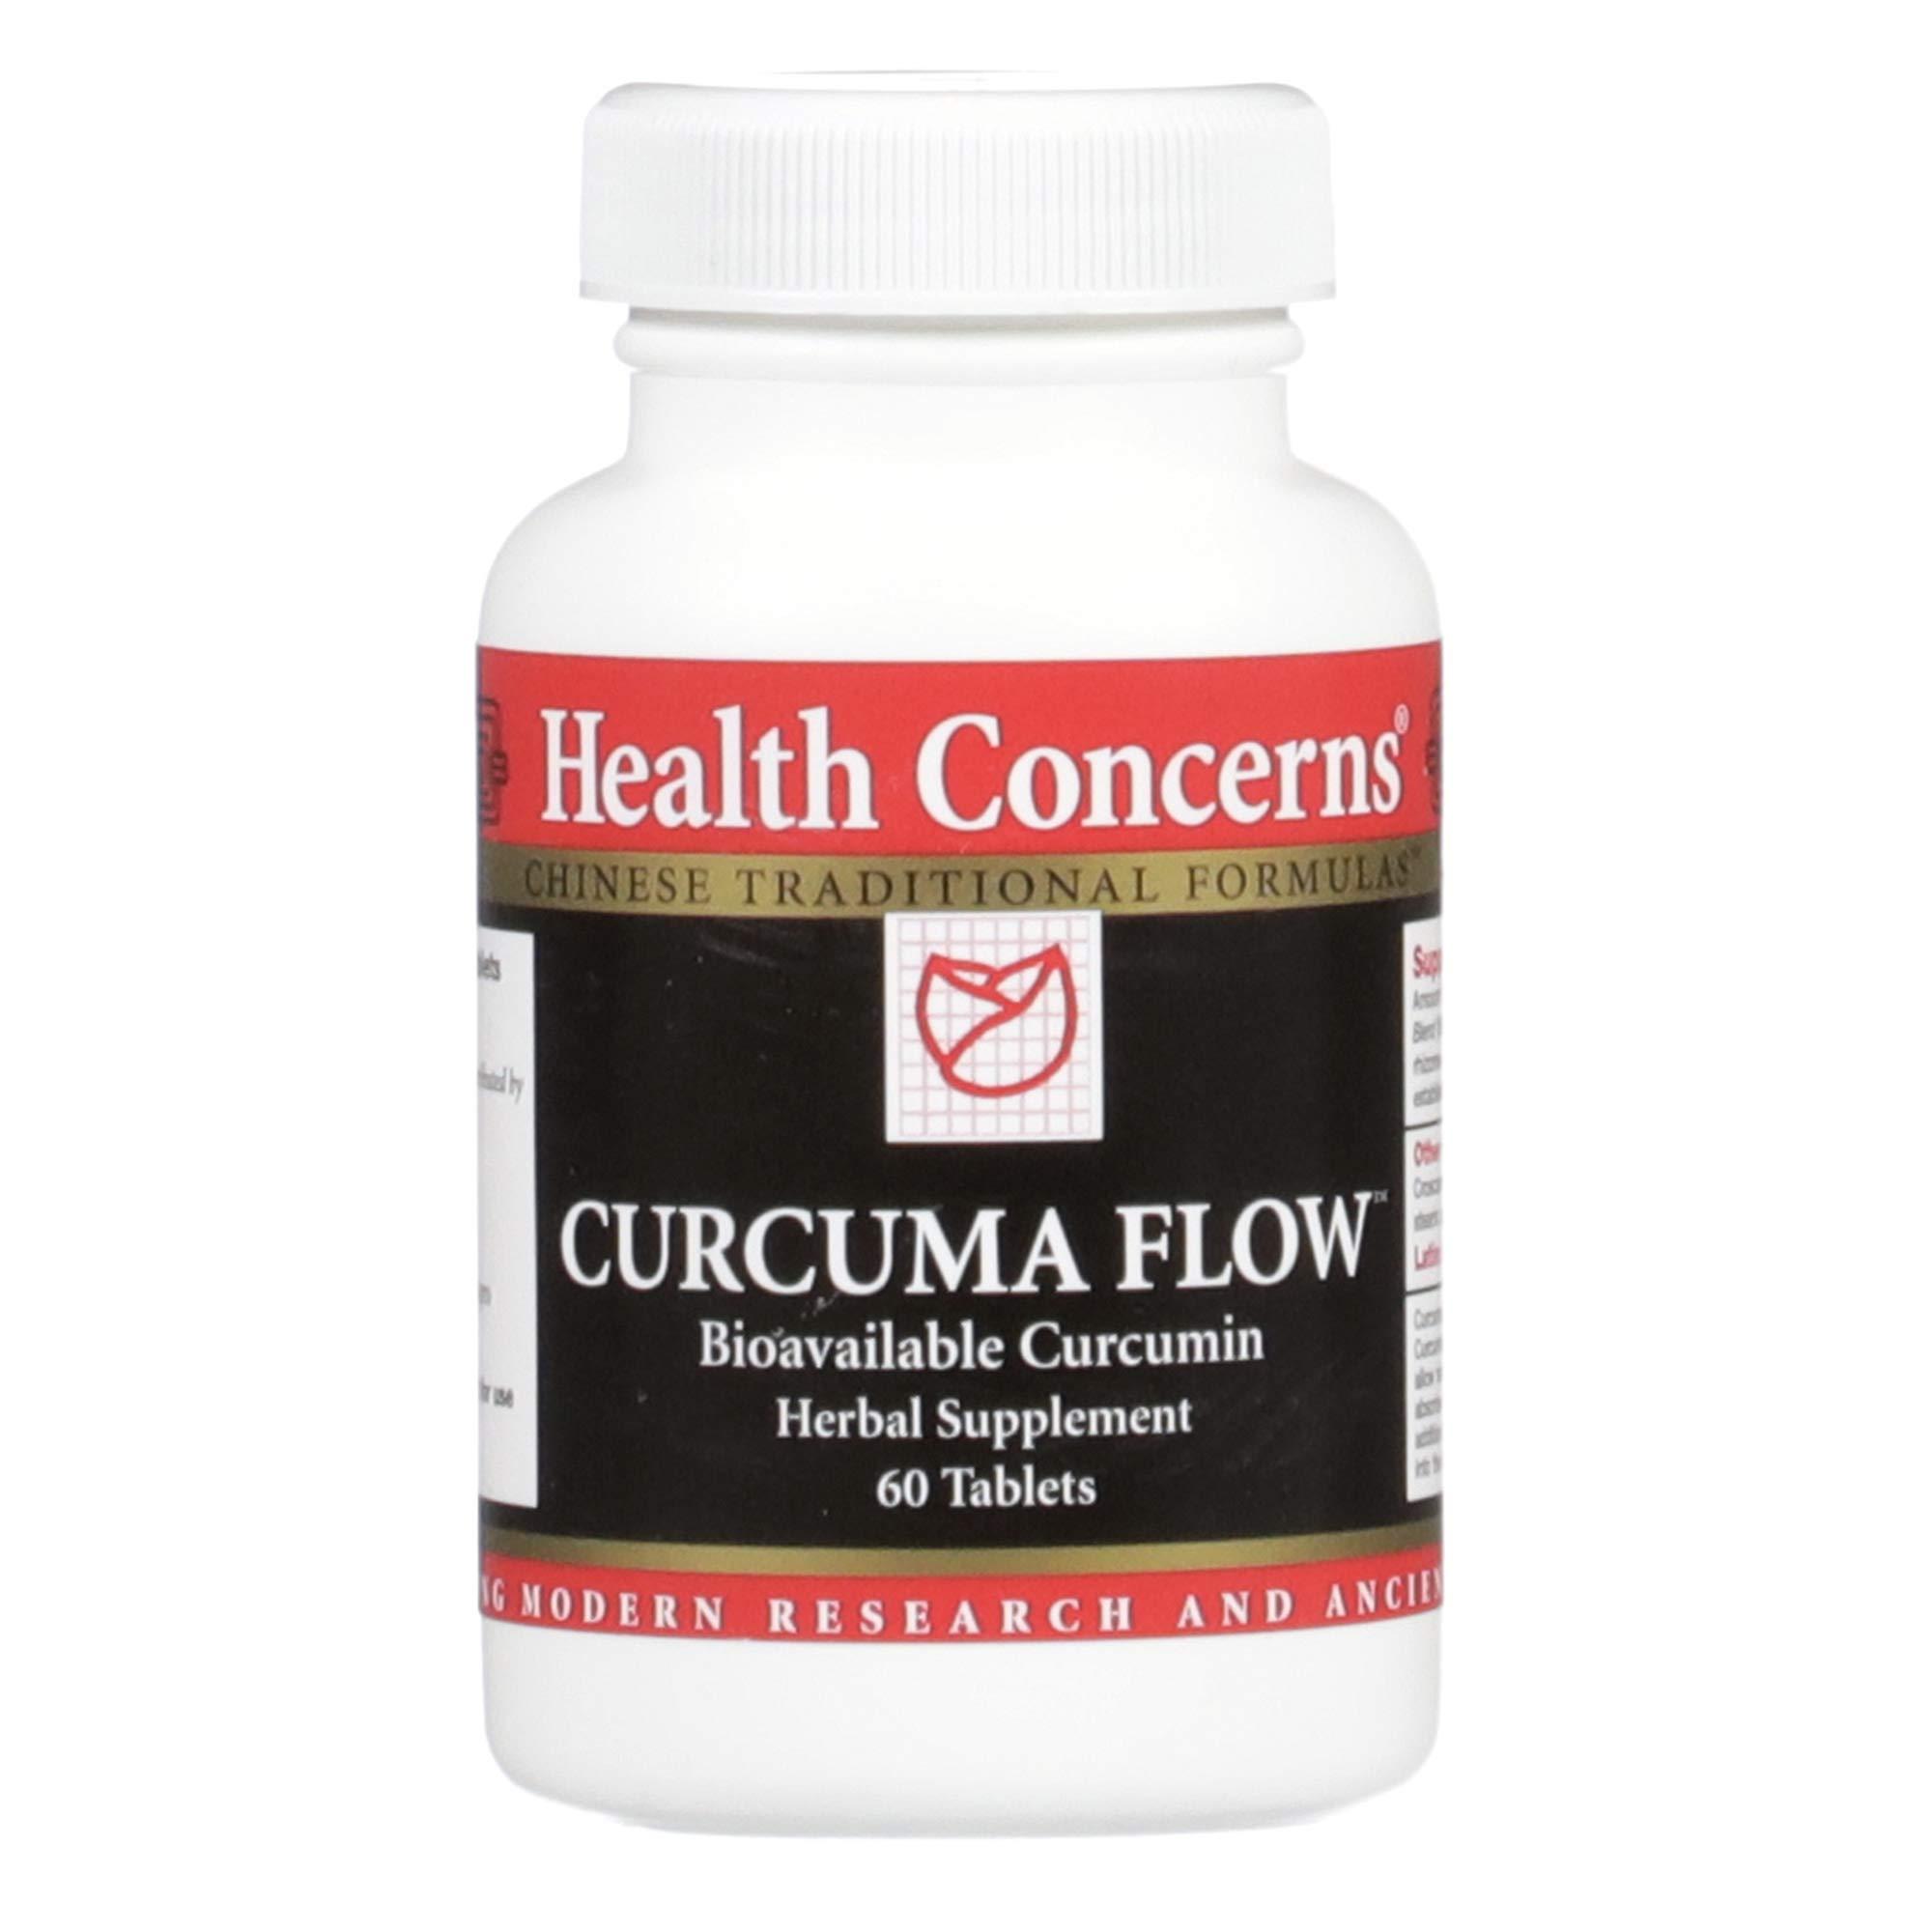 Health Concerns - Curcuma Flow - Bioavailable Turmeric Herbal Supplement - 60 tabs